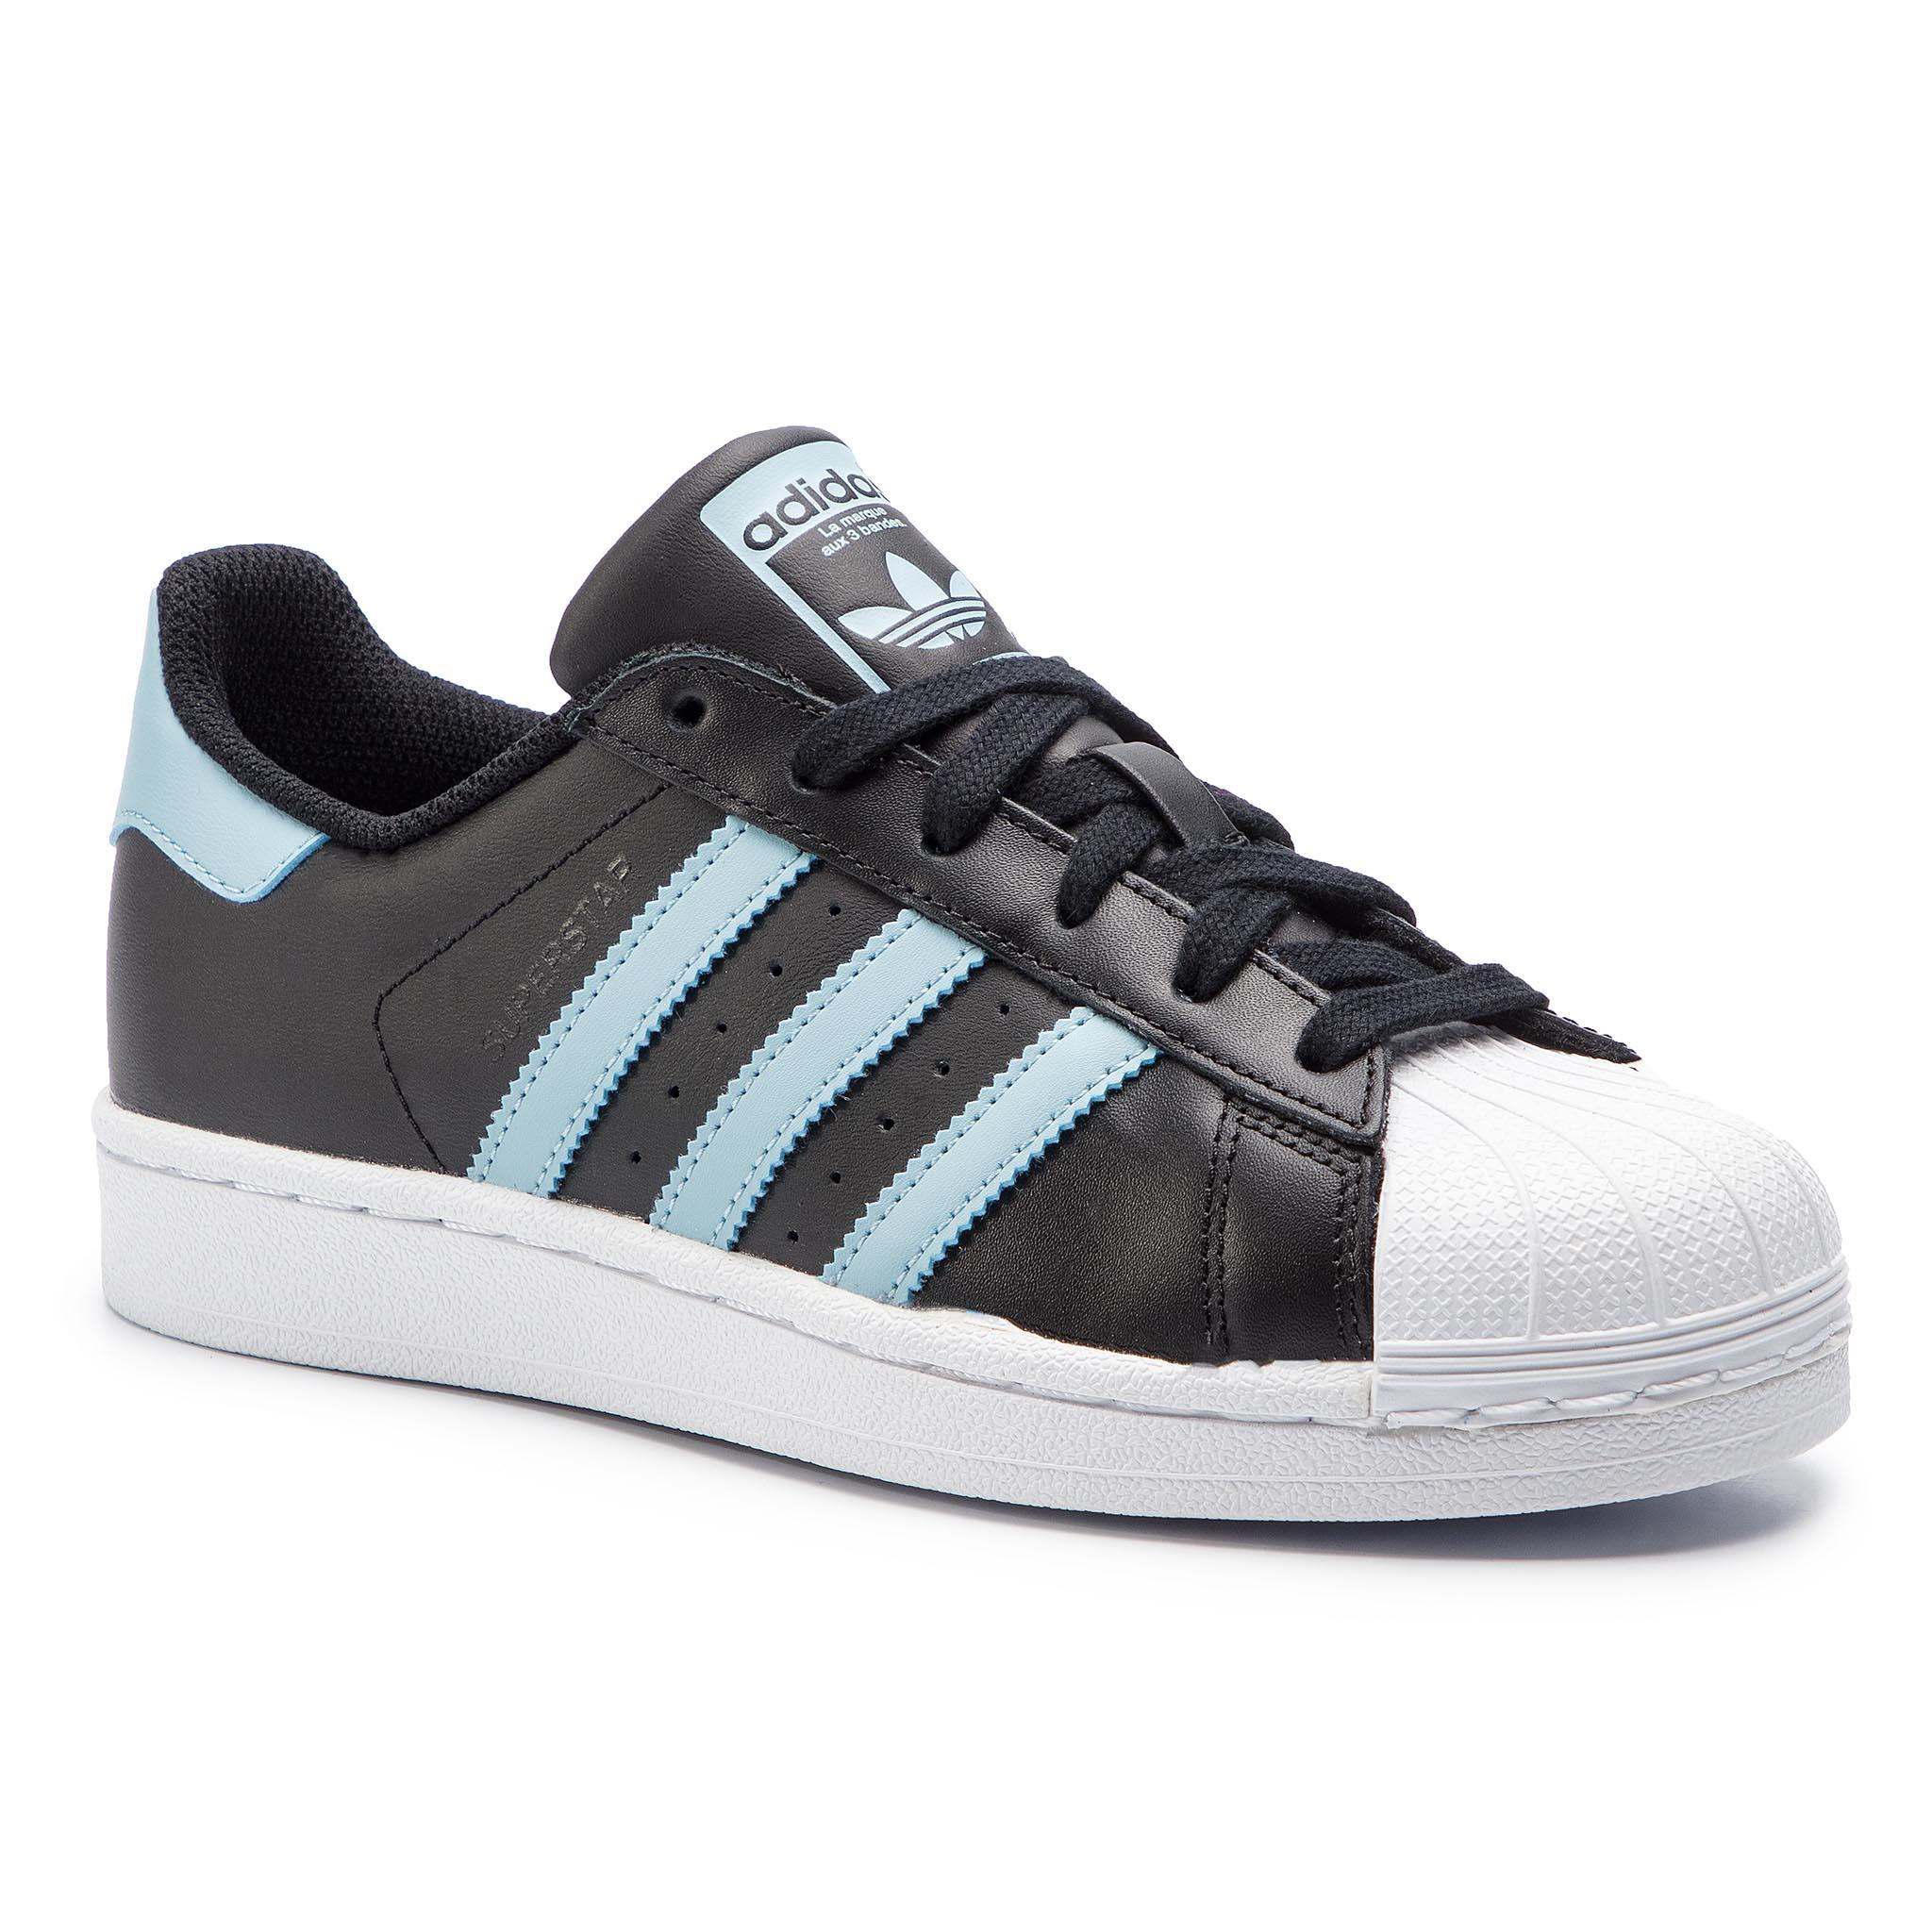 bb218dfc7b27a Shoes adidas - Superstar B41994 Cblack Borang Ftwwht - Sneakers ...